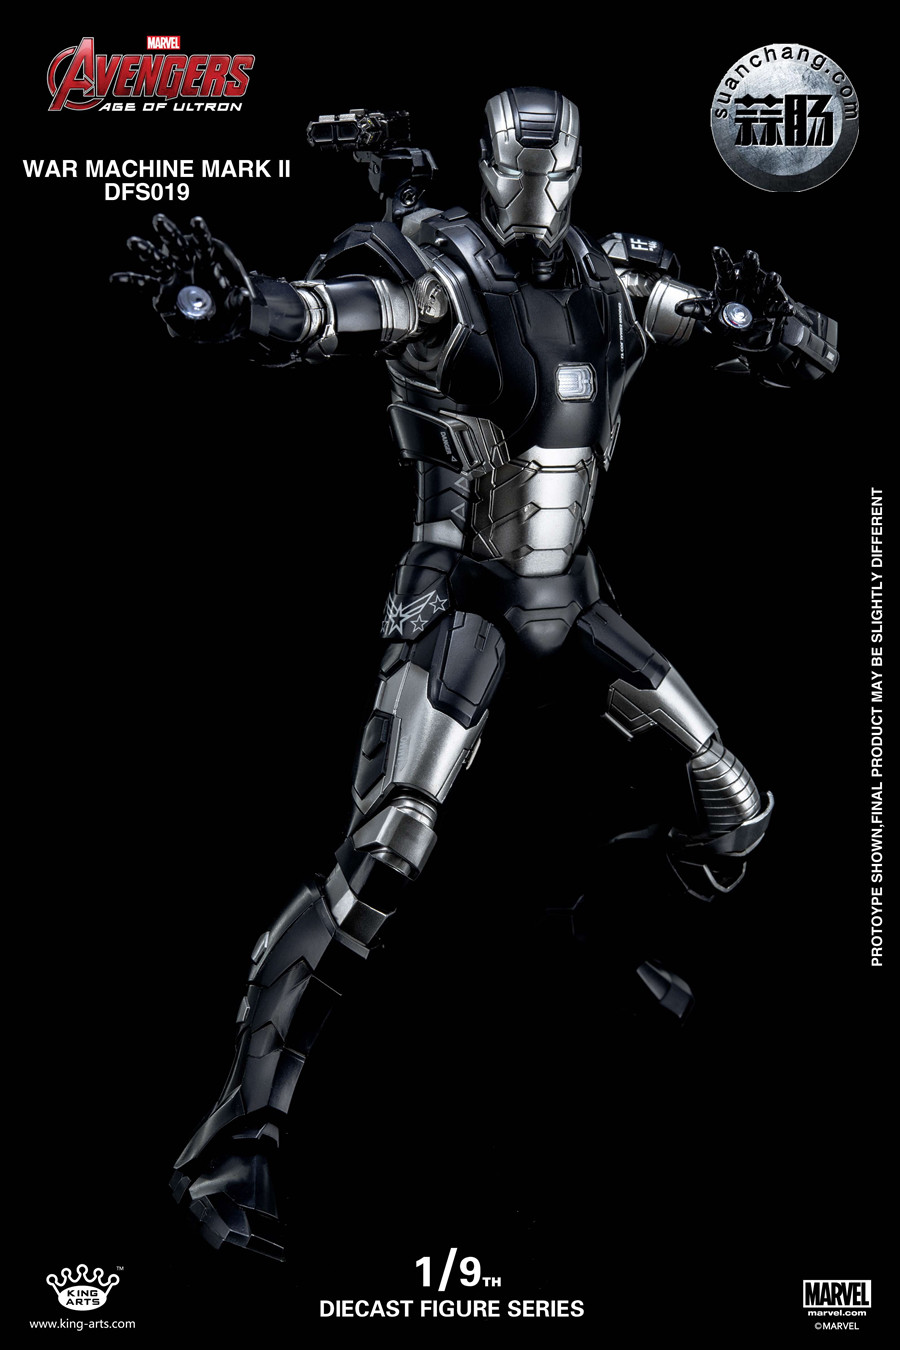 King Arts 新品 1/9  战争机器MK2  合金可动人偶发售 模玩 第5张